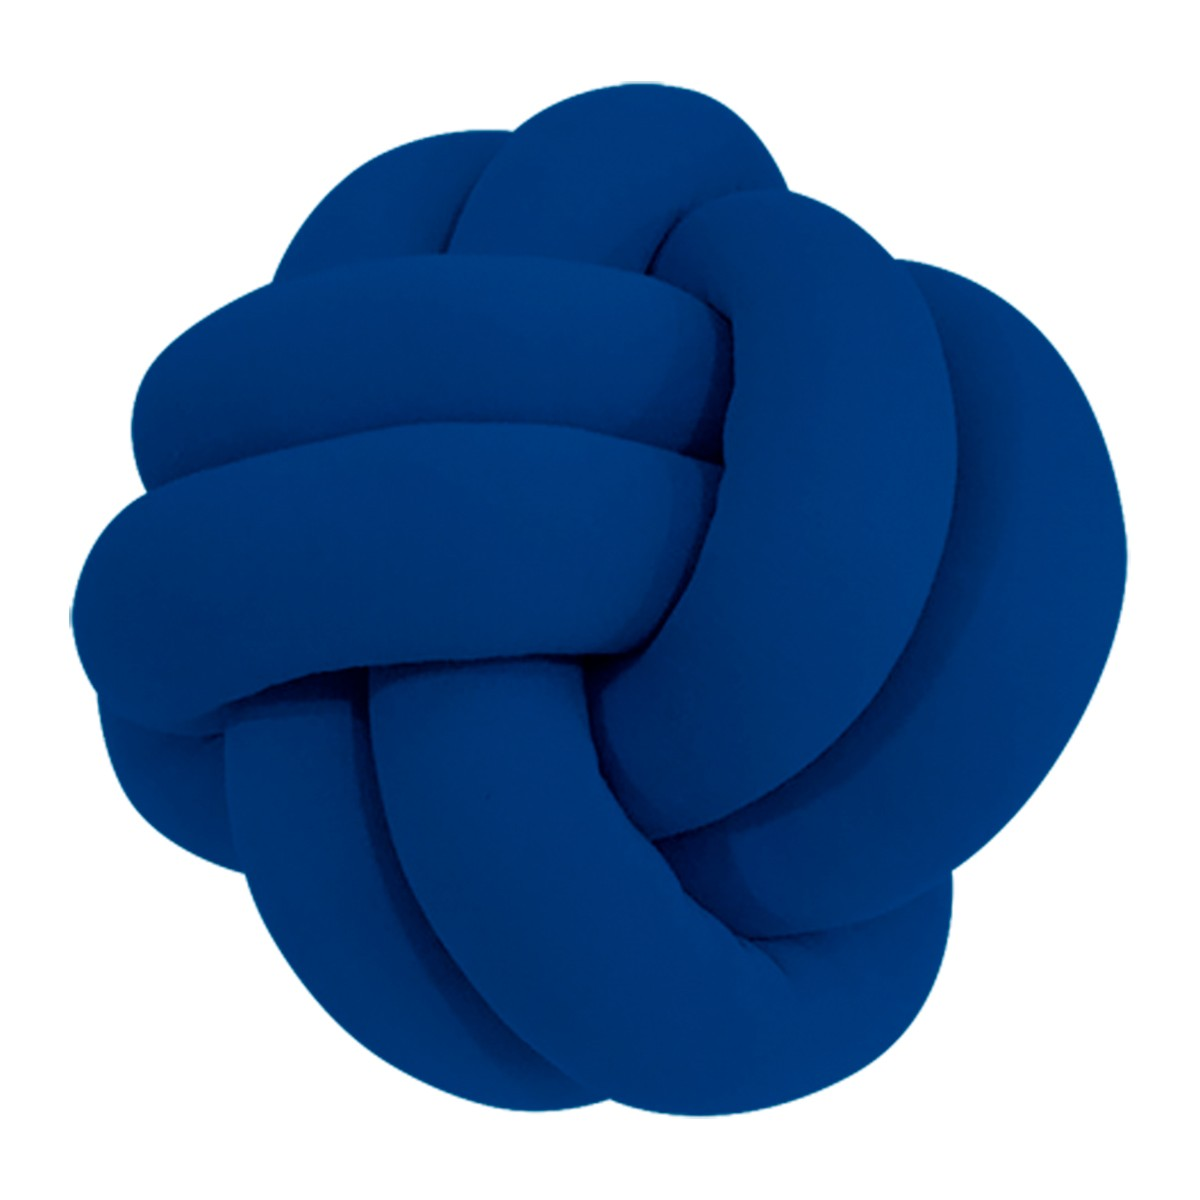 Almofada de No Escandinavo Decorativa Azul Royal 29cm